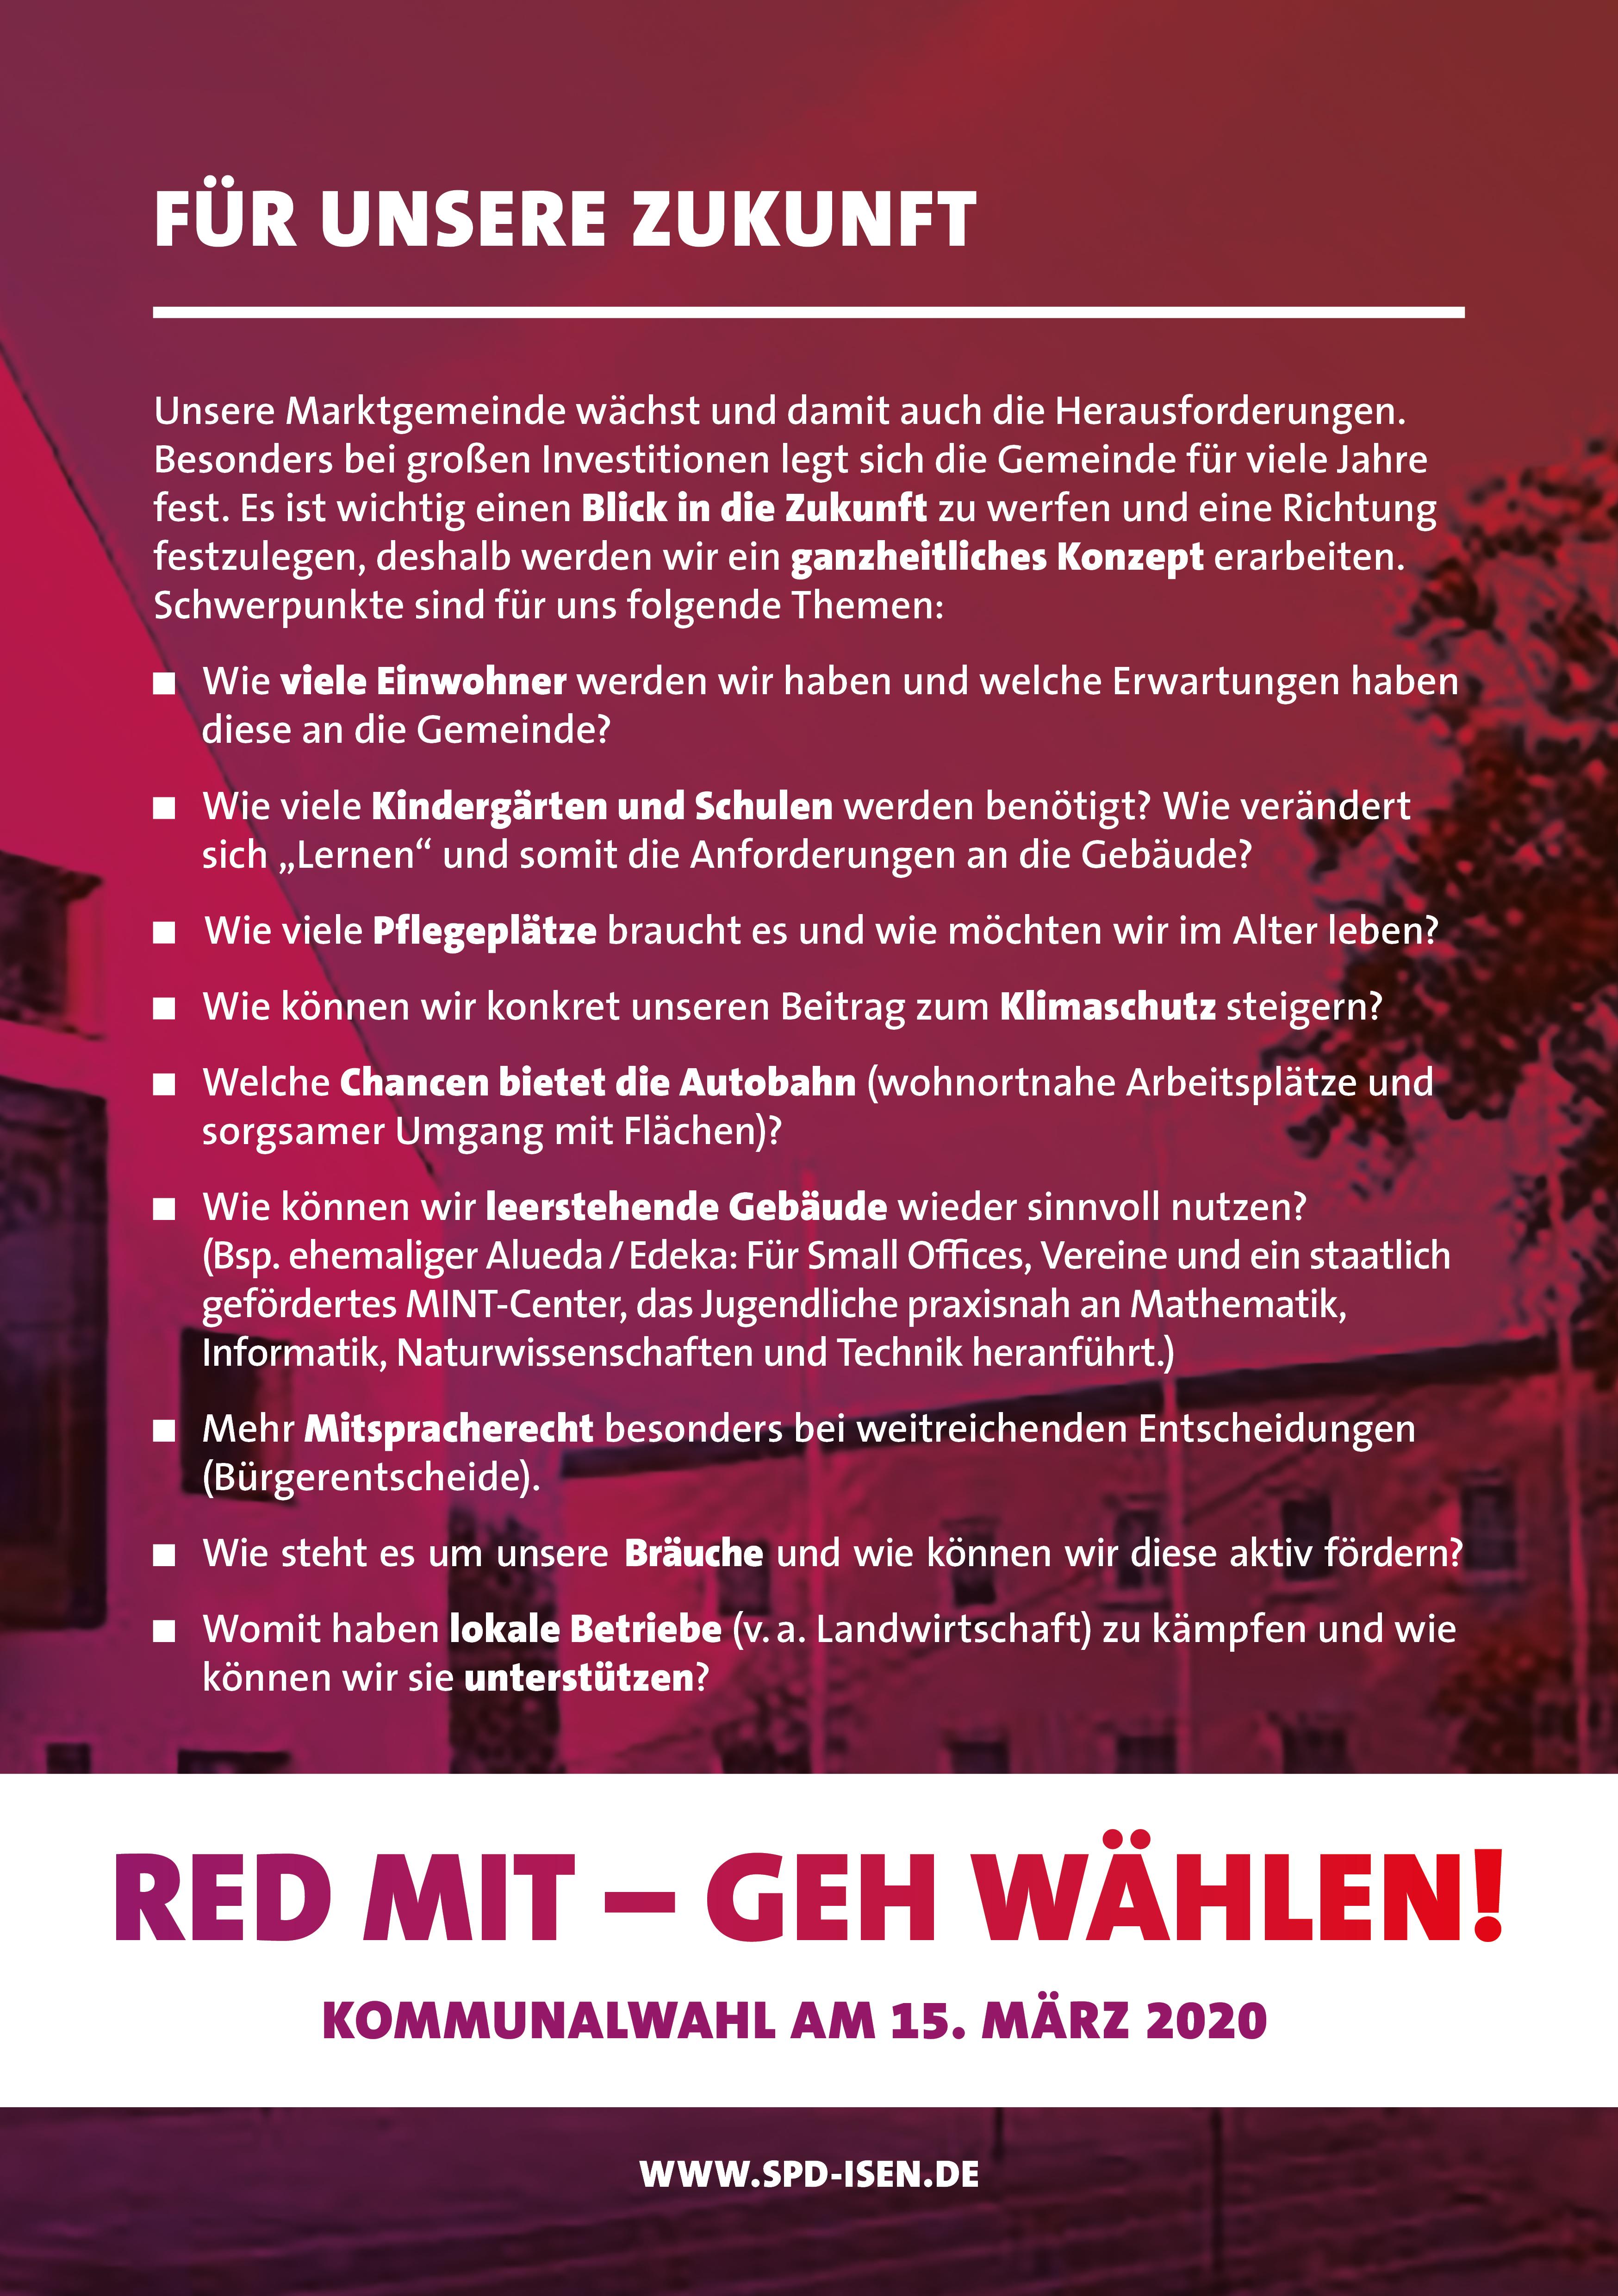 SPD_Kommunal-Flyer-2020_V4b_web7